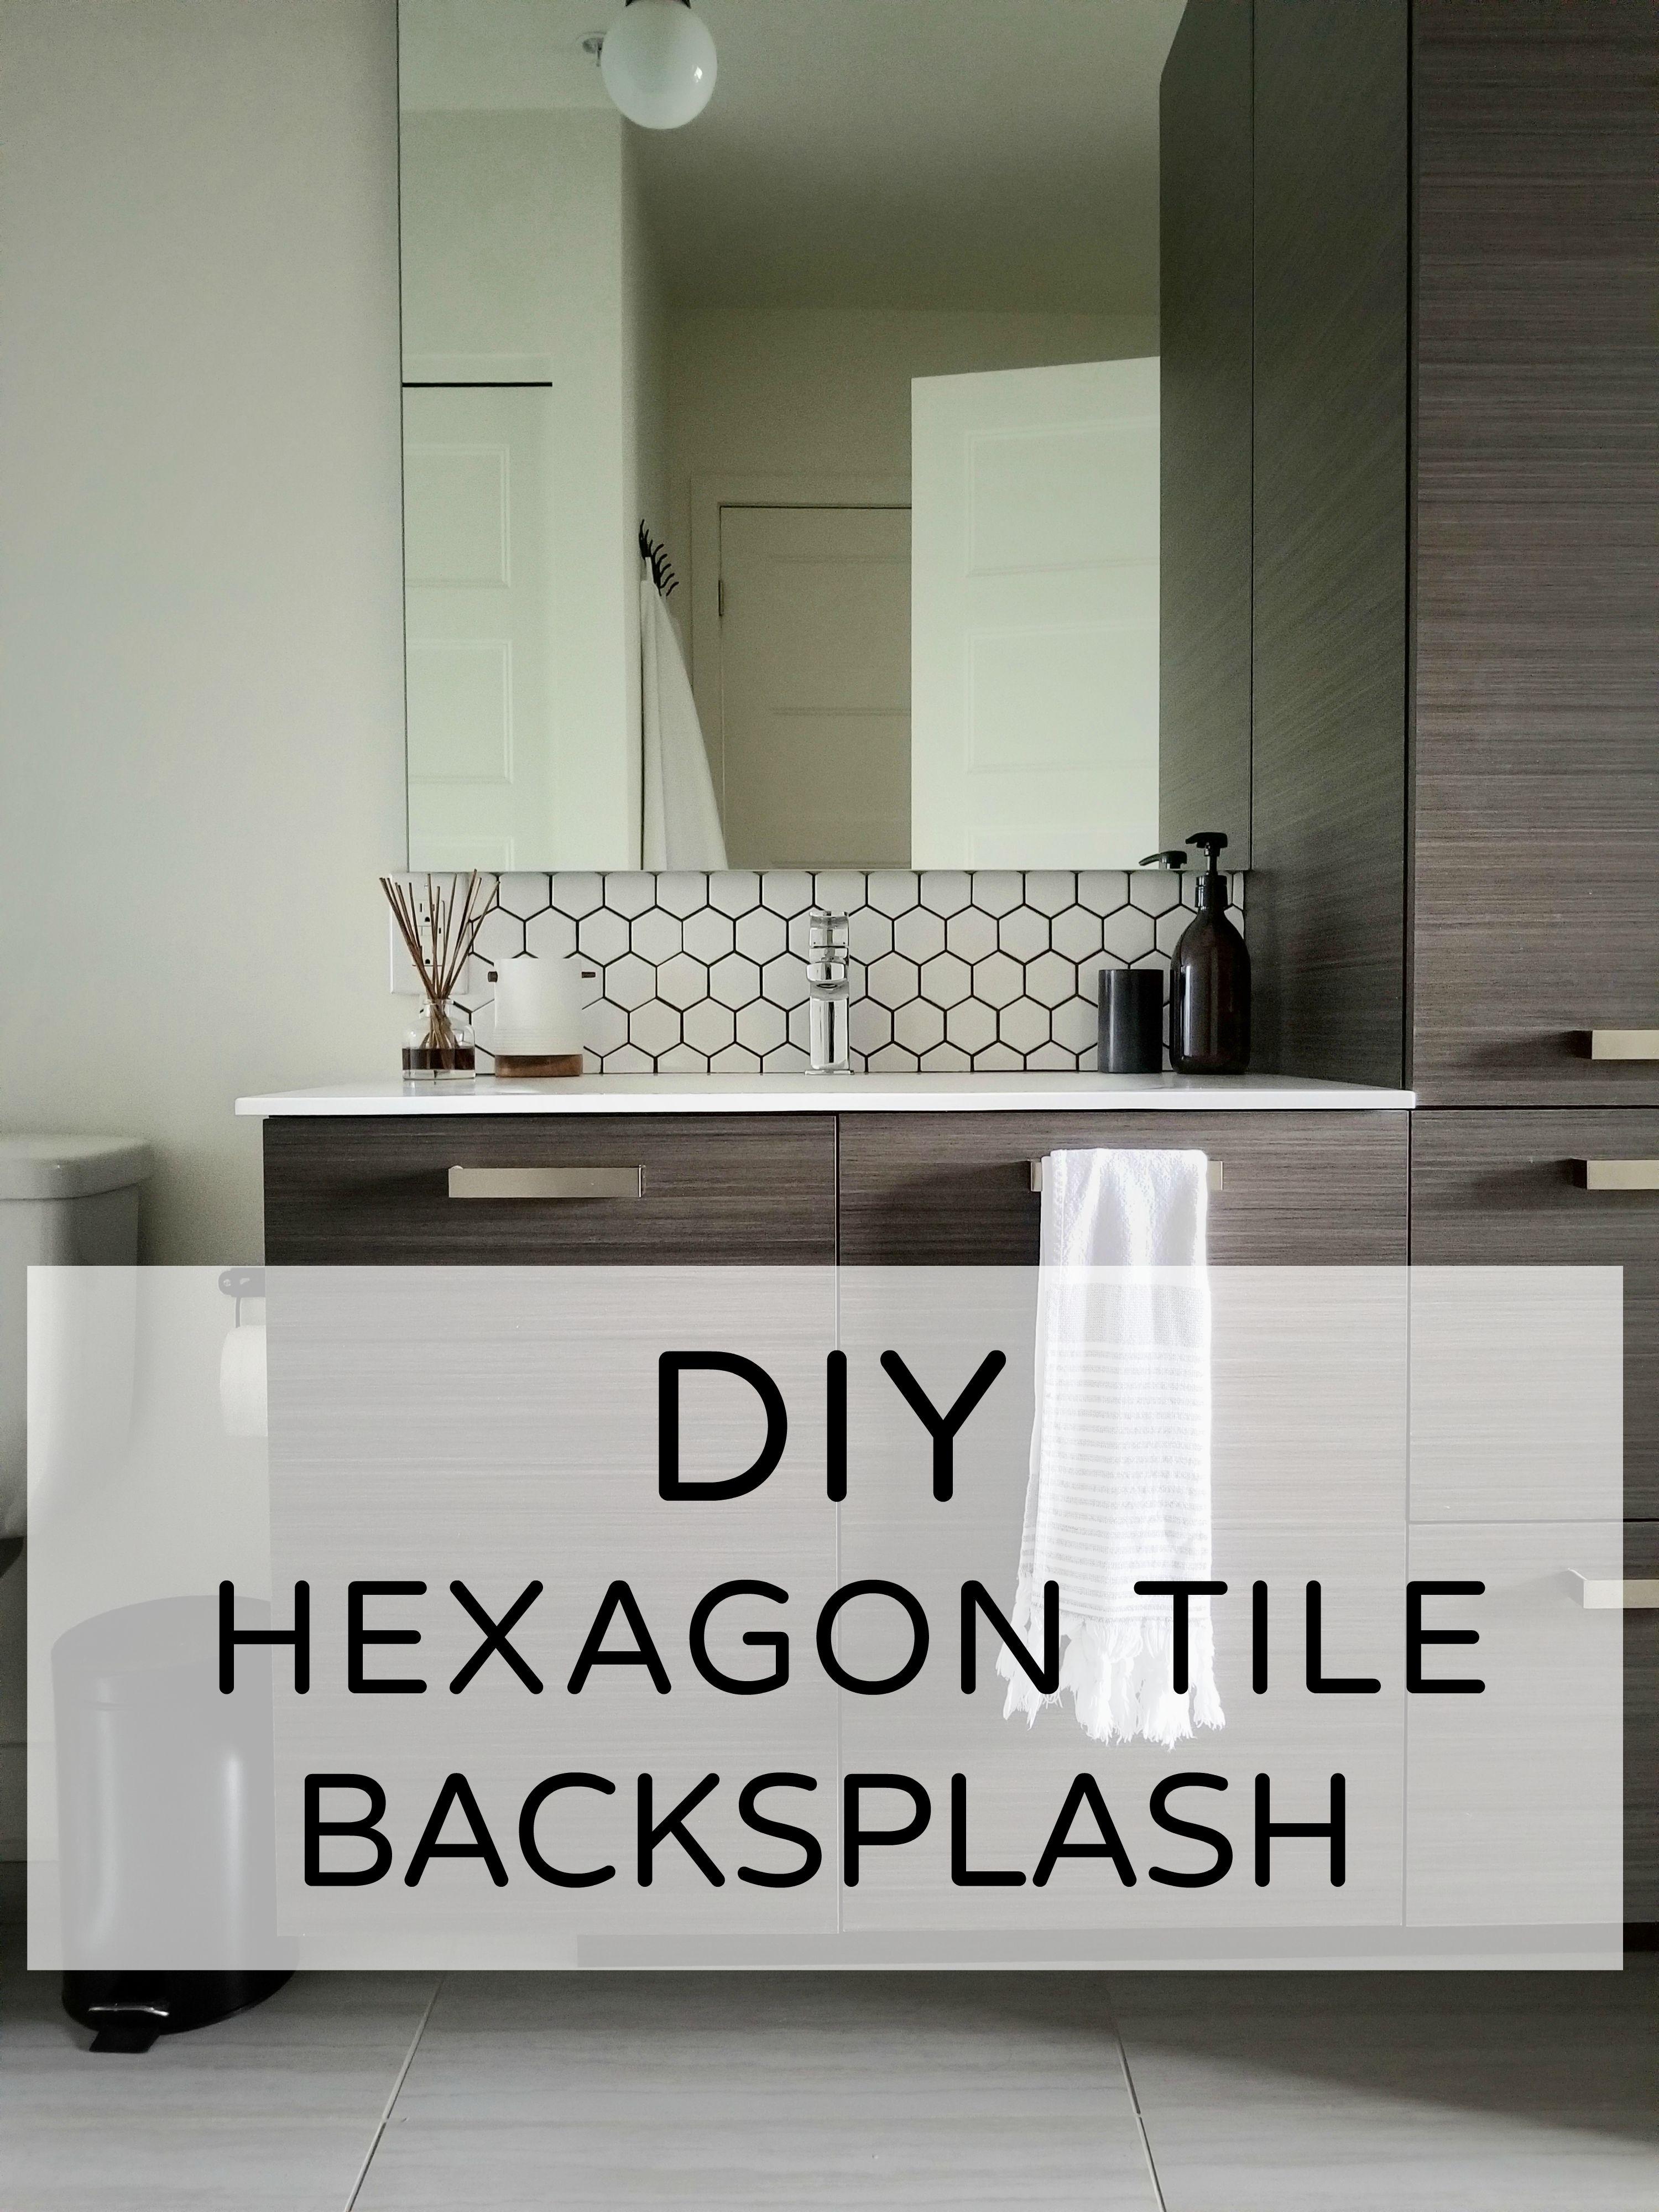 Pretty 1 Inch Hexagon Floor Tiles Small 17 X 17 Floor Tile Rectangular 2 X 4 Ceiling Tiles 24X24 Drop Ceiling Tiles Old 3 X 12 Subway Tile Coloured3 X 9 Subway Tile Hexagon Tile Backsplash: How To Install Hex Tiles With Adhesive Tile ..